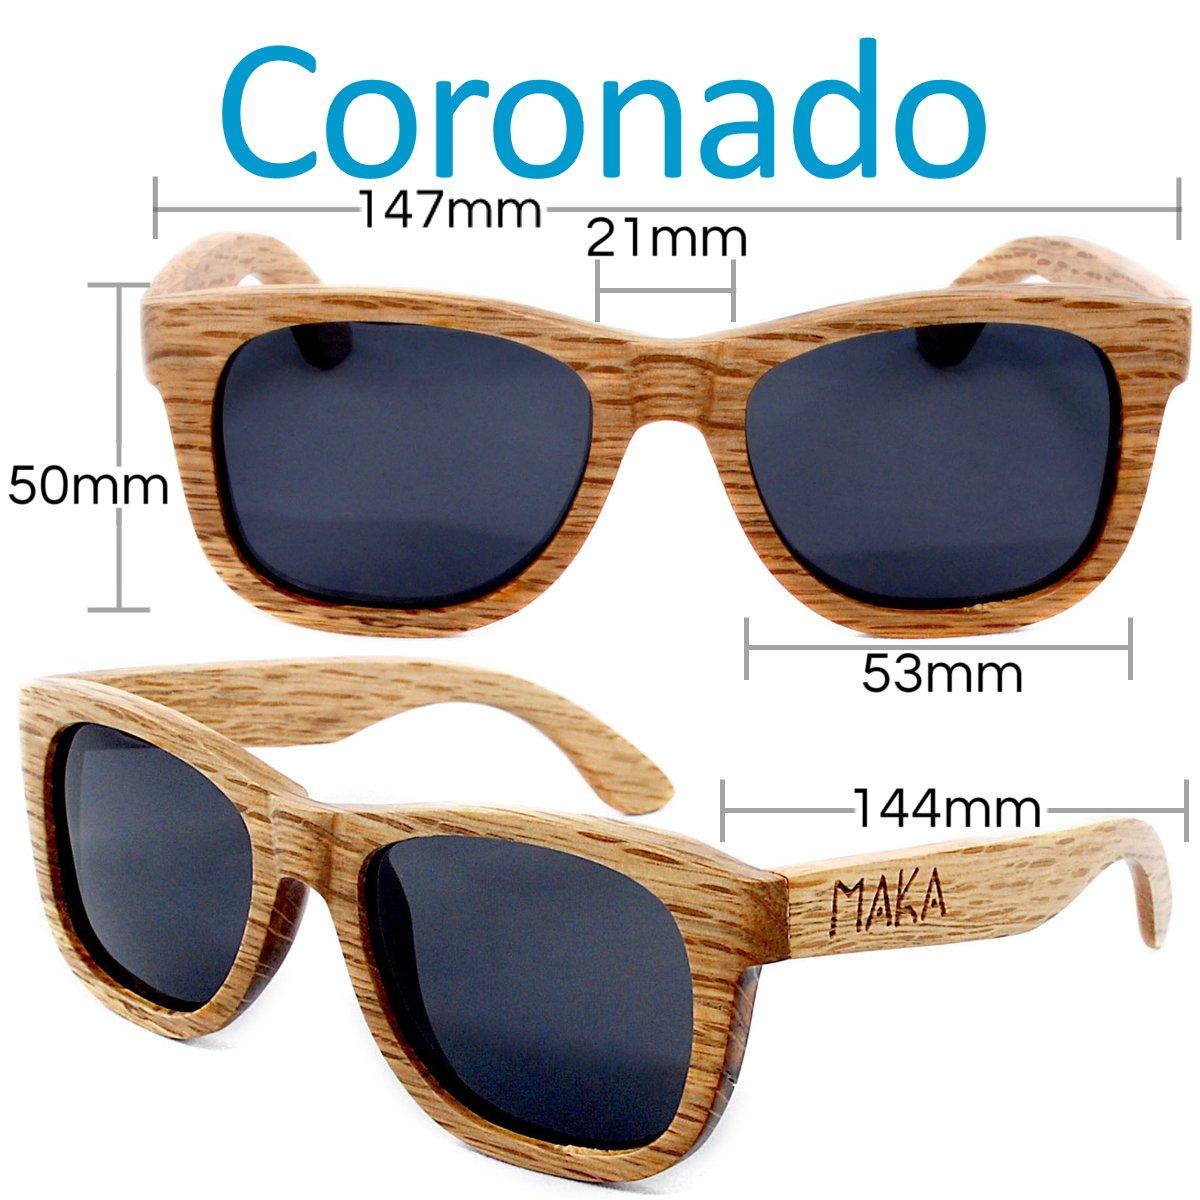 5434fb6735 Amazon.com  Maka Wear Wood Sunglasses - Coronado Wayfarer Style Polarized  Duwood Sunglasses  Sports   Outdoors